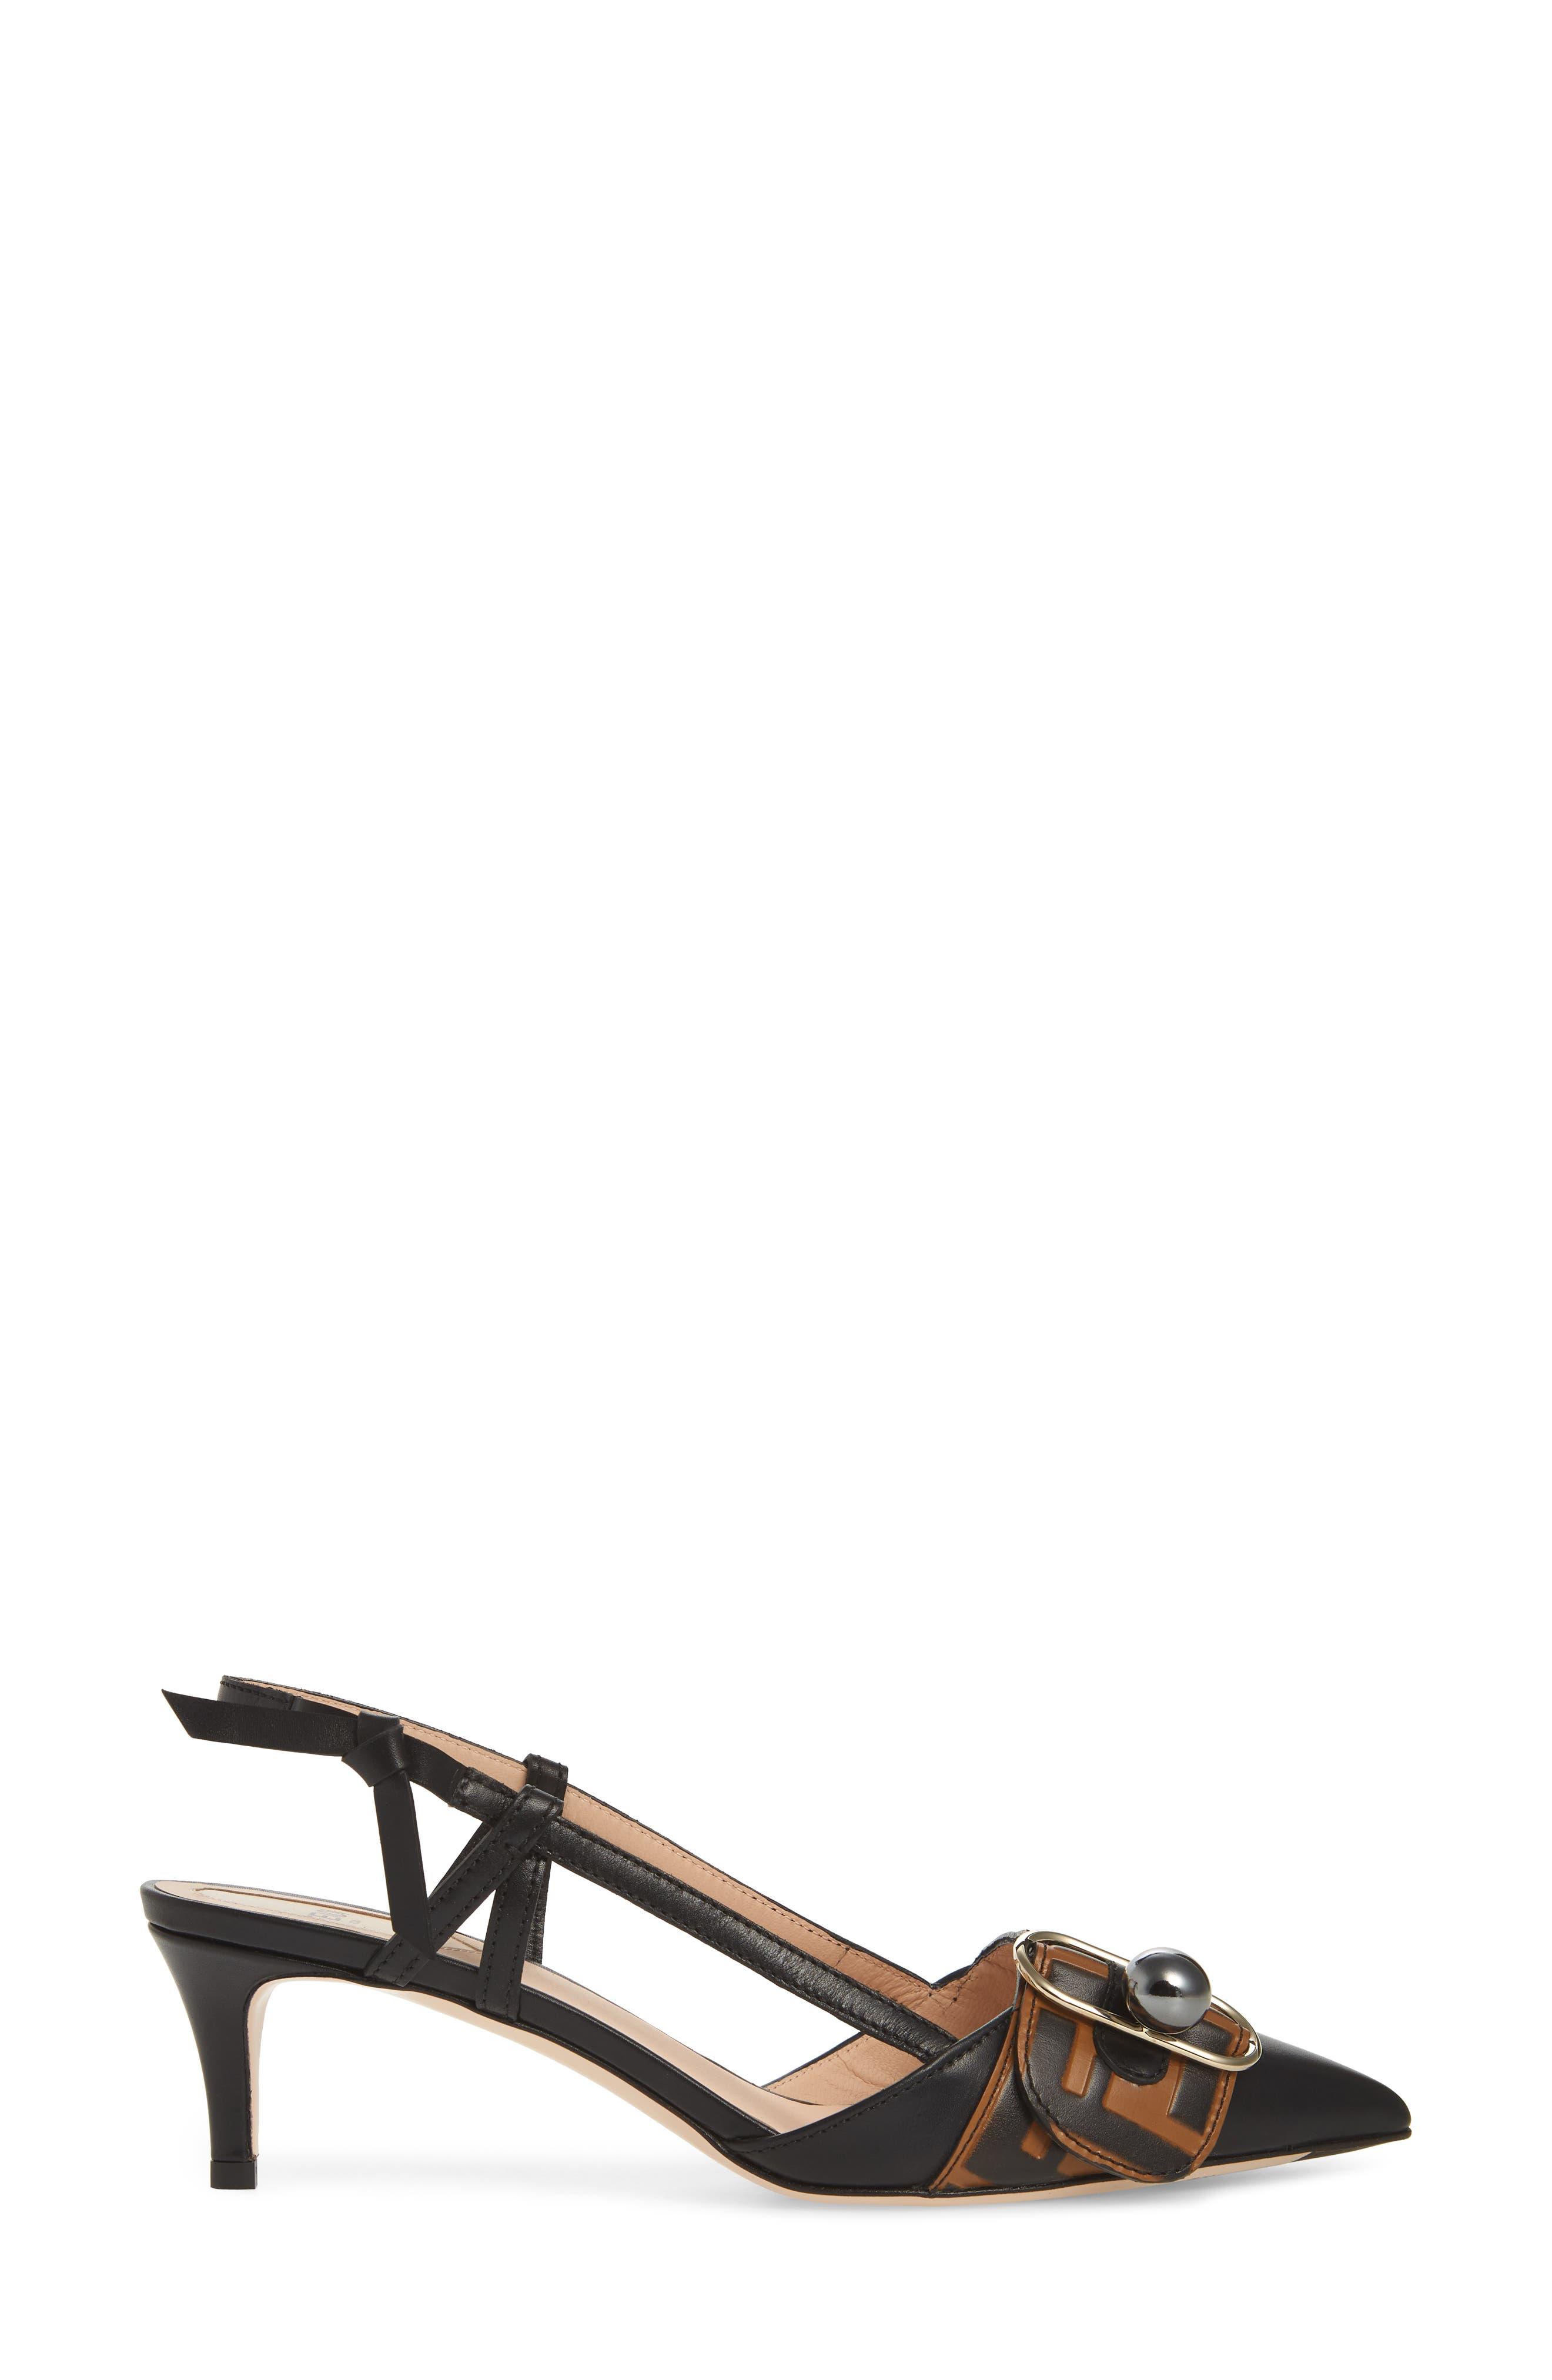 Fendi Women's Pearland Slingback Sandal wzydBhu6Kc